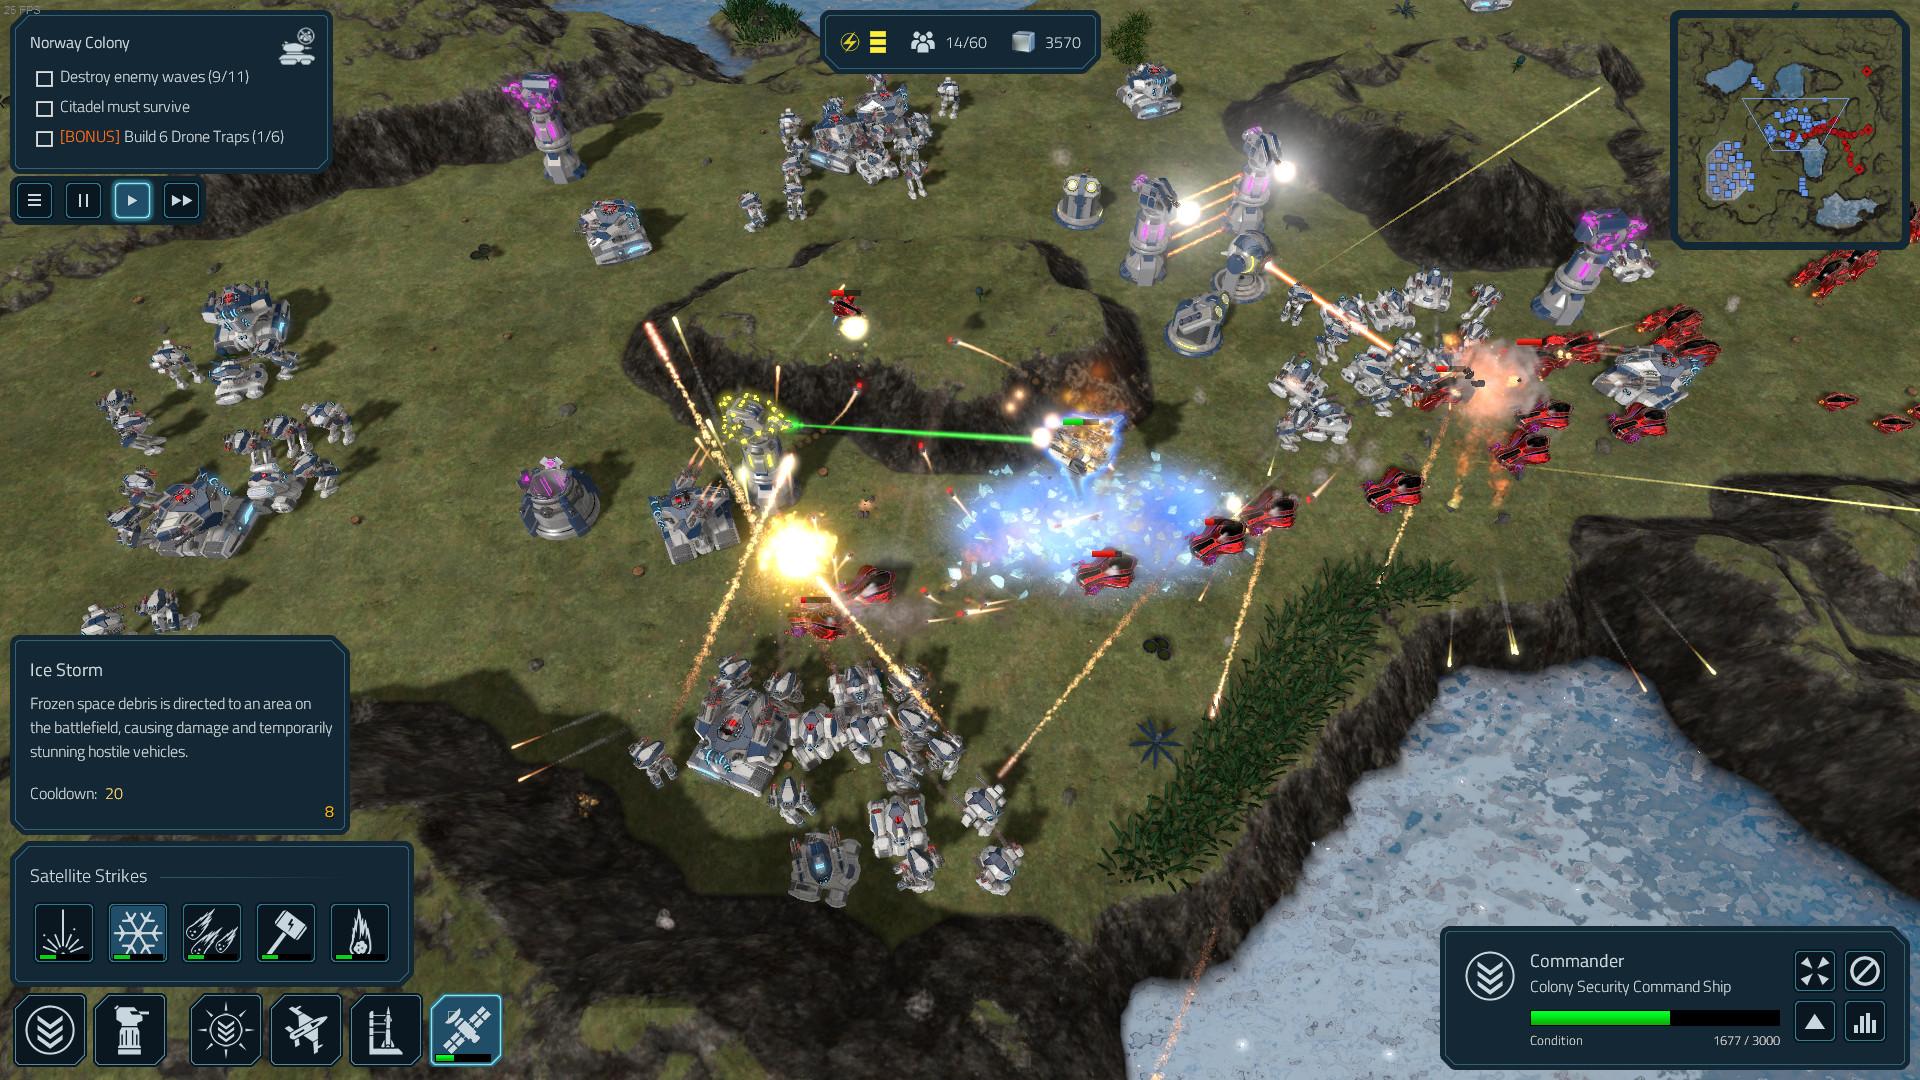 colony-siege-pc-screenshot-02